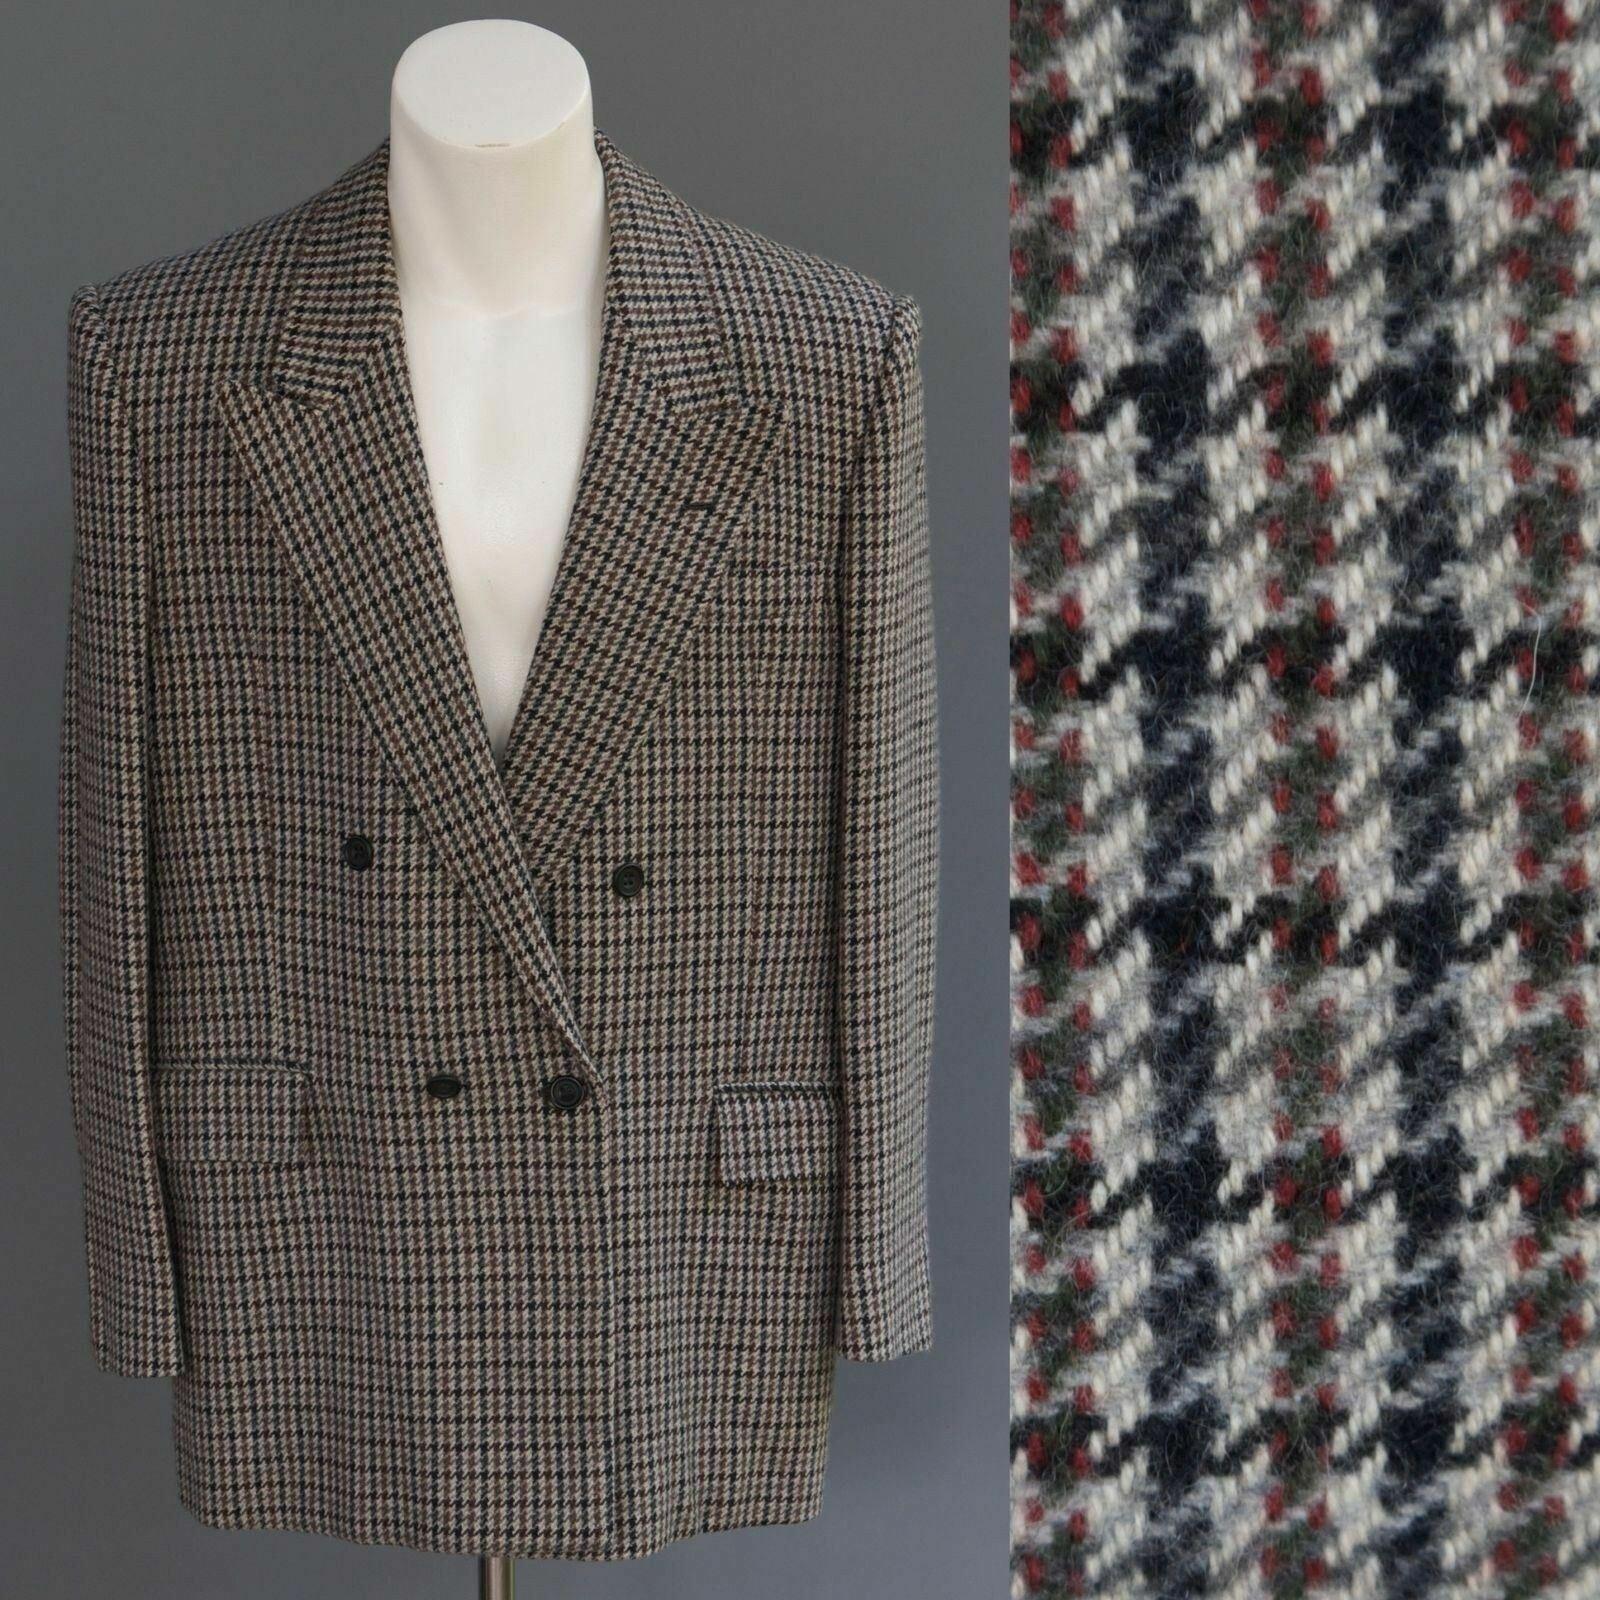 Umberto Corrieri 100% Cashmere grau Houndstooth Tweed jacke